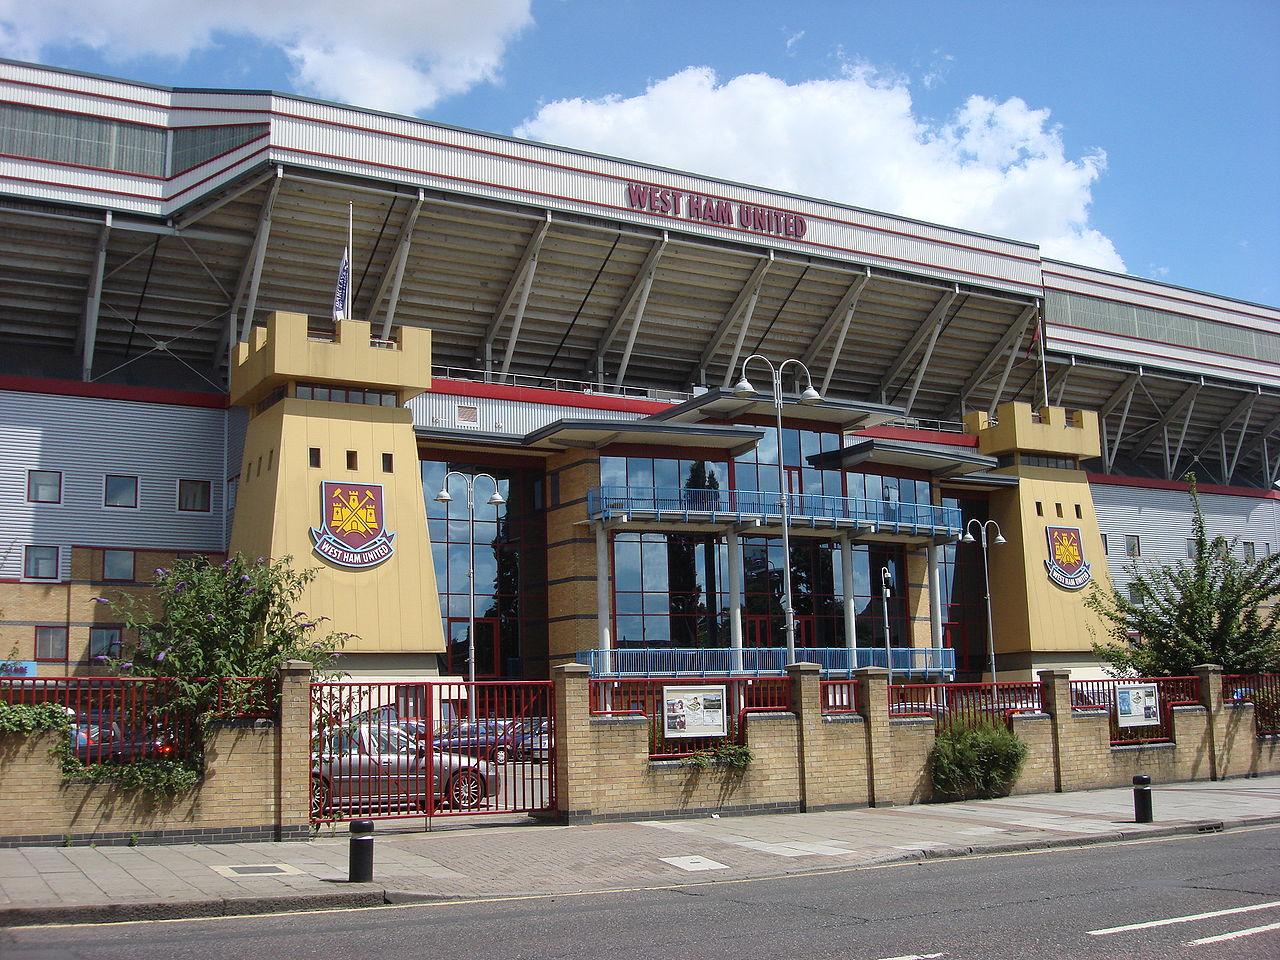 L'ingresso principale del Boleyn Ground/Upton Park